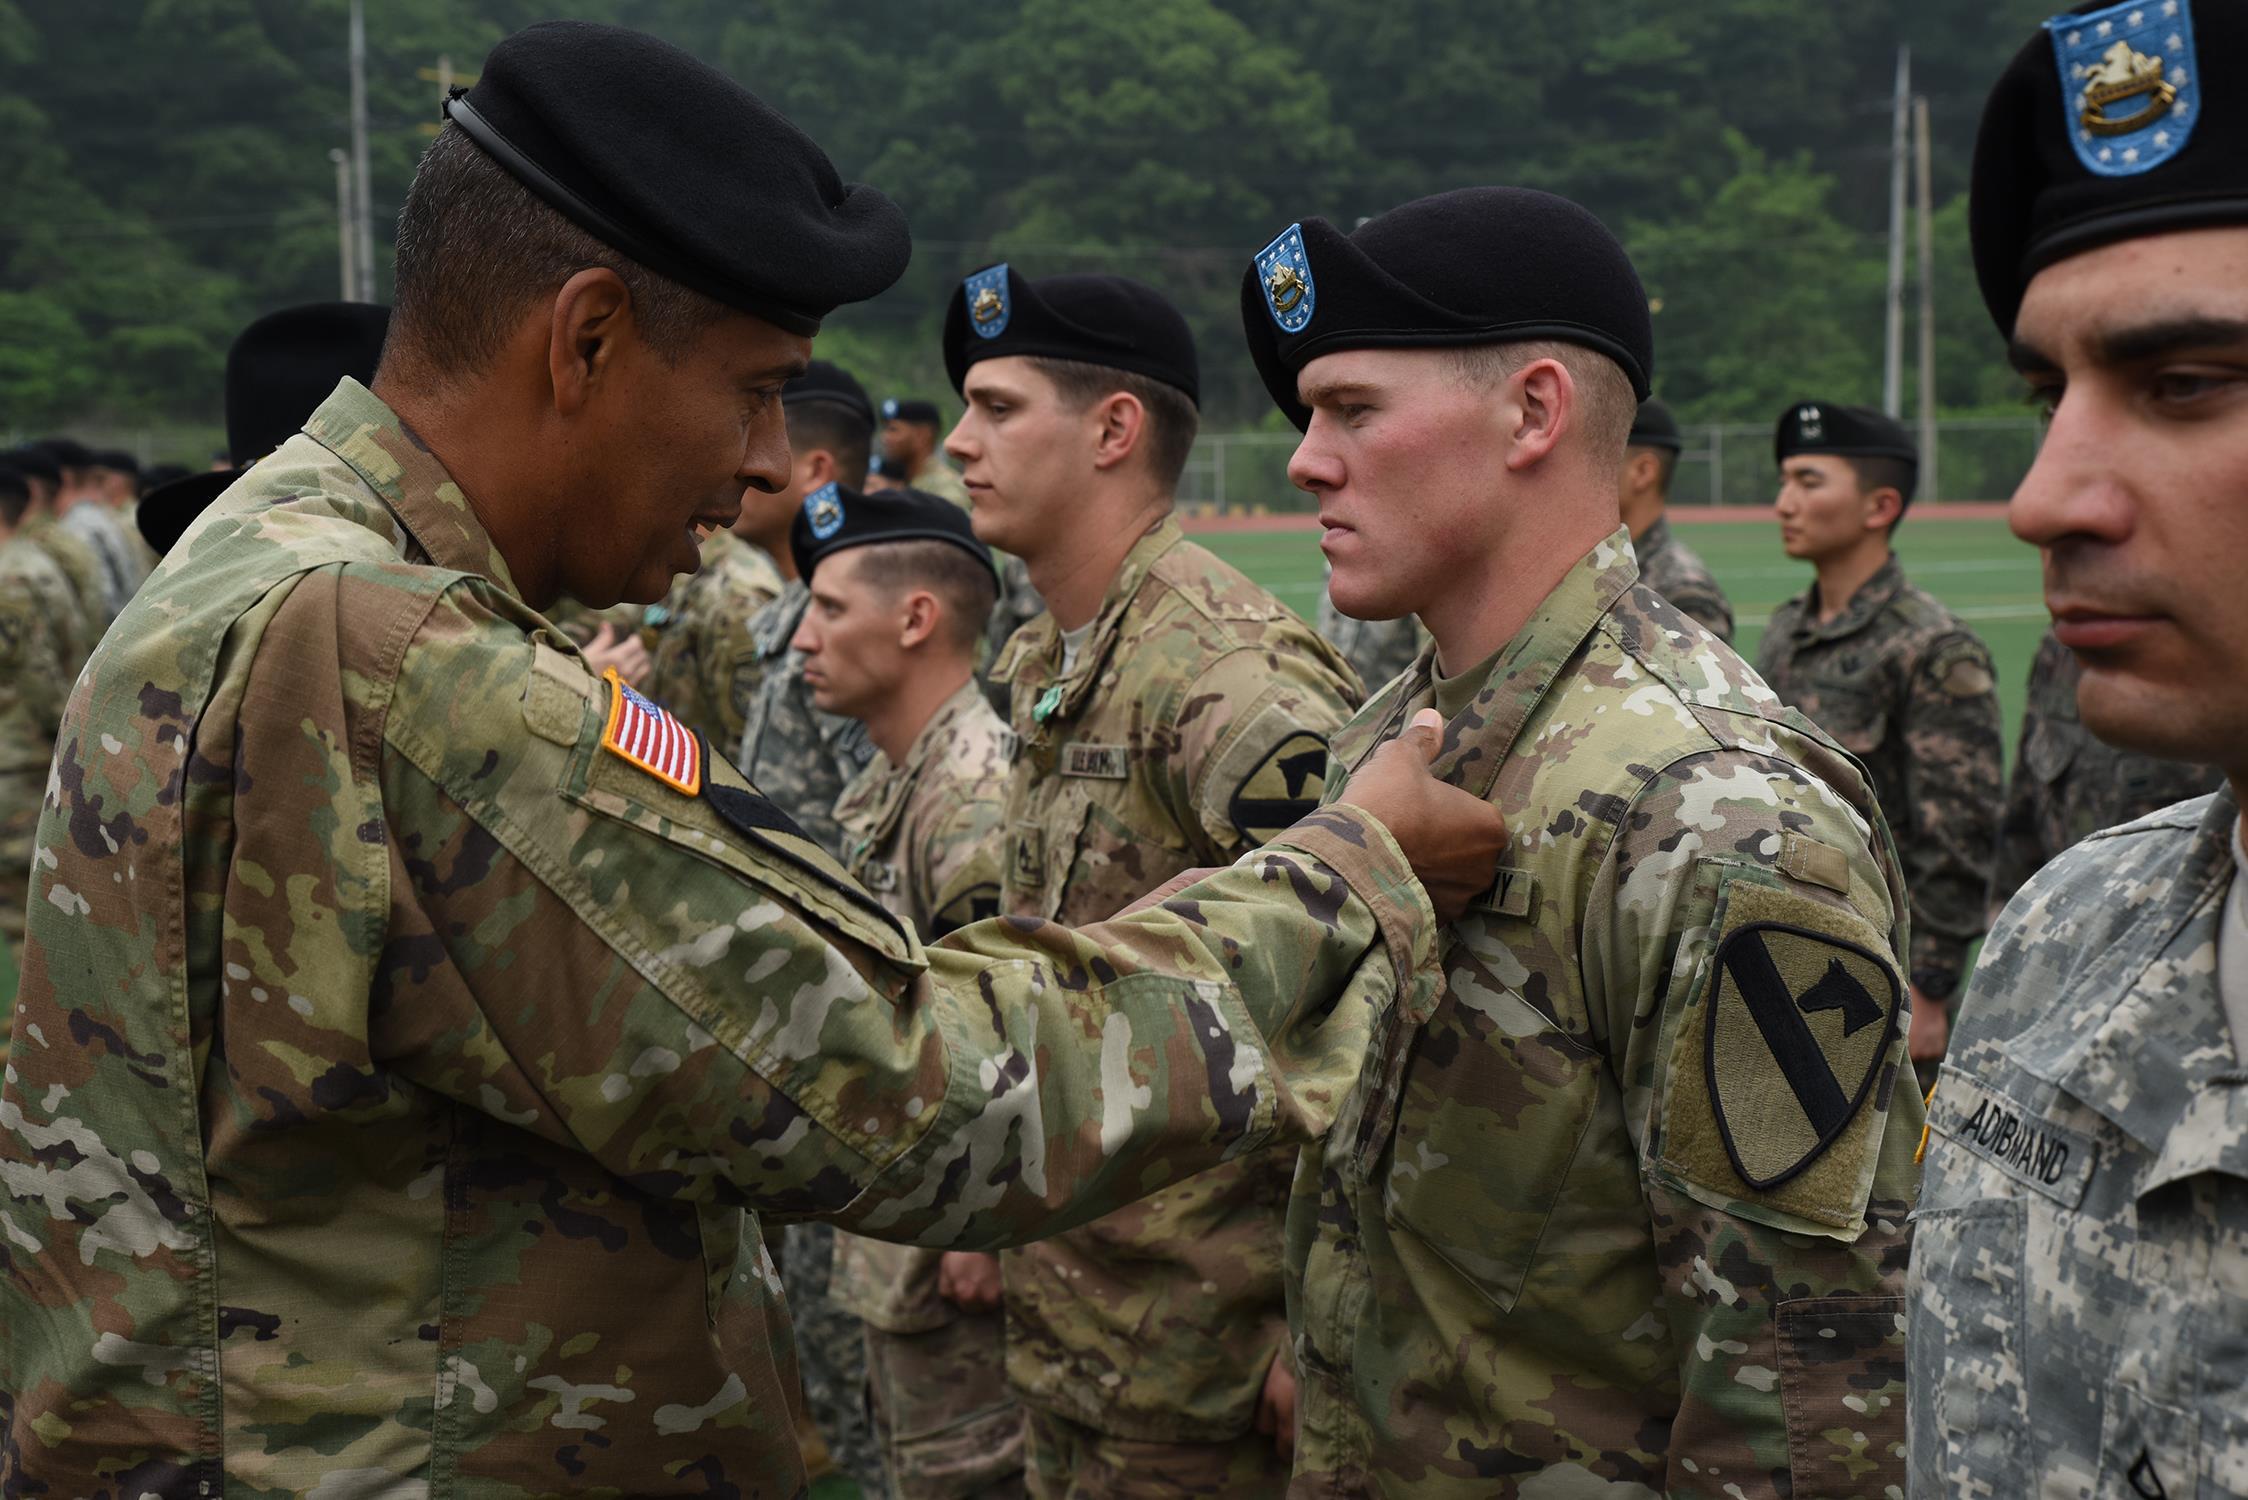 Infantryman Combat Army Us Korea Badge